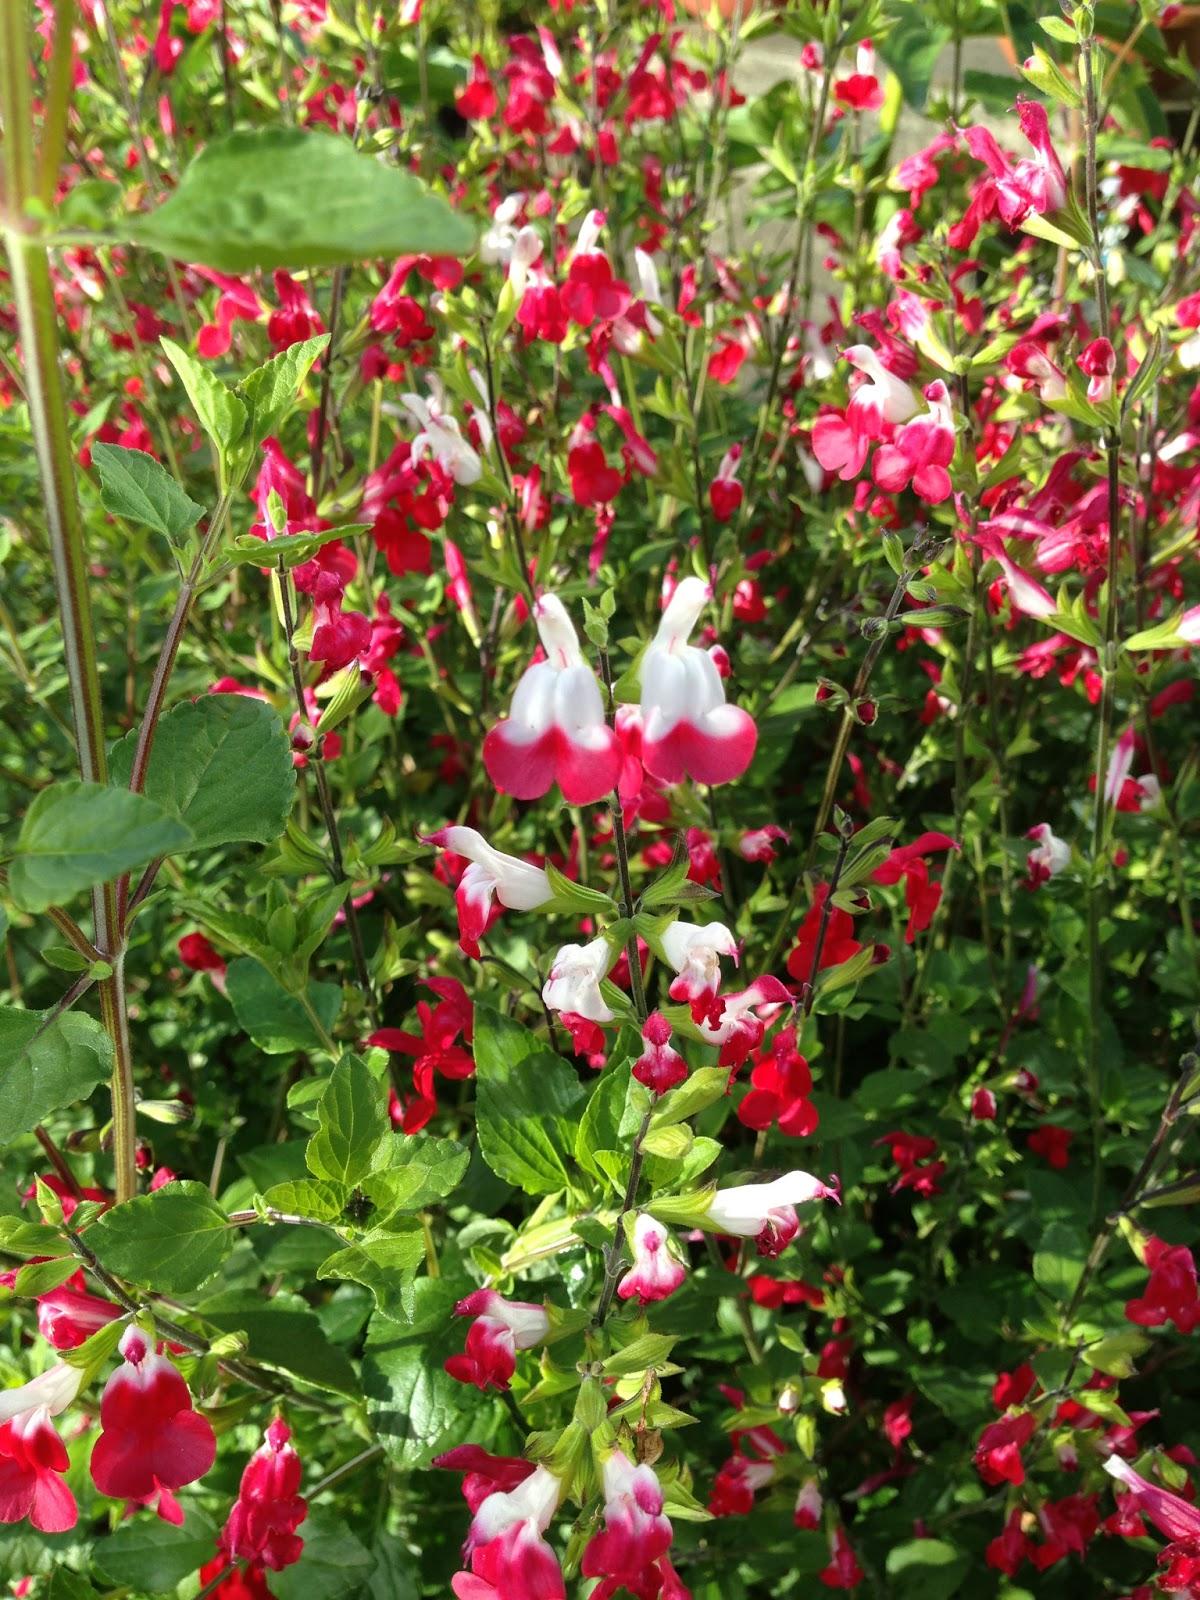 The Lents Farmer: Favorite Plant in the Garden - Hot Lips!